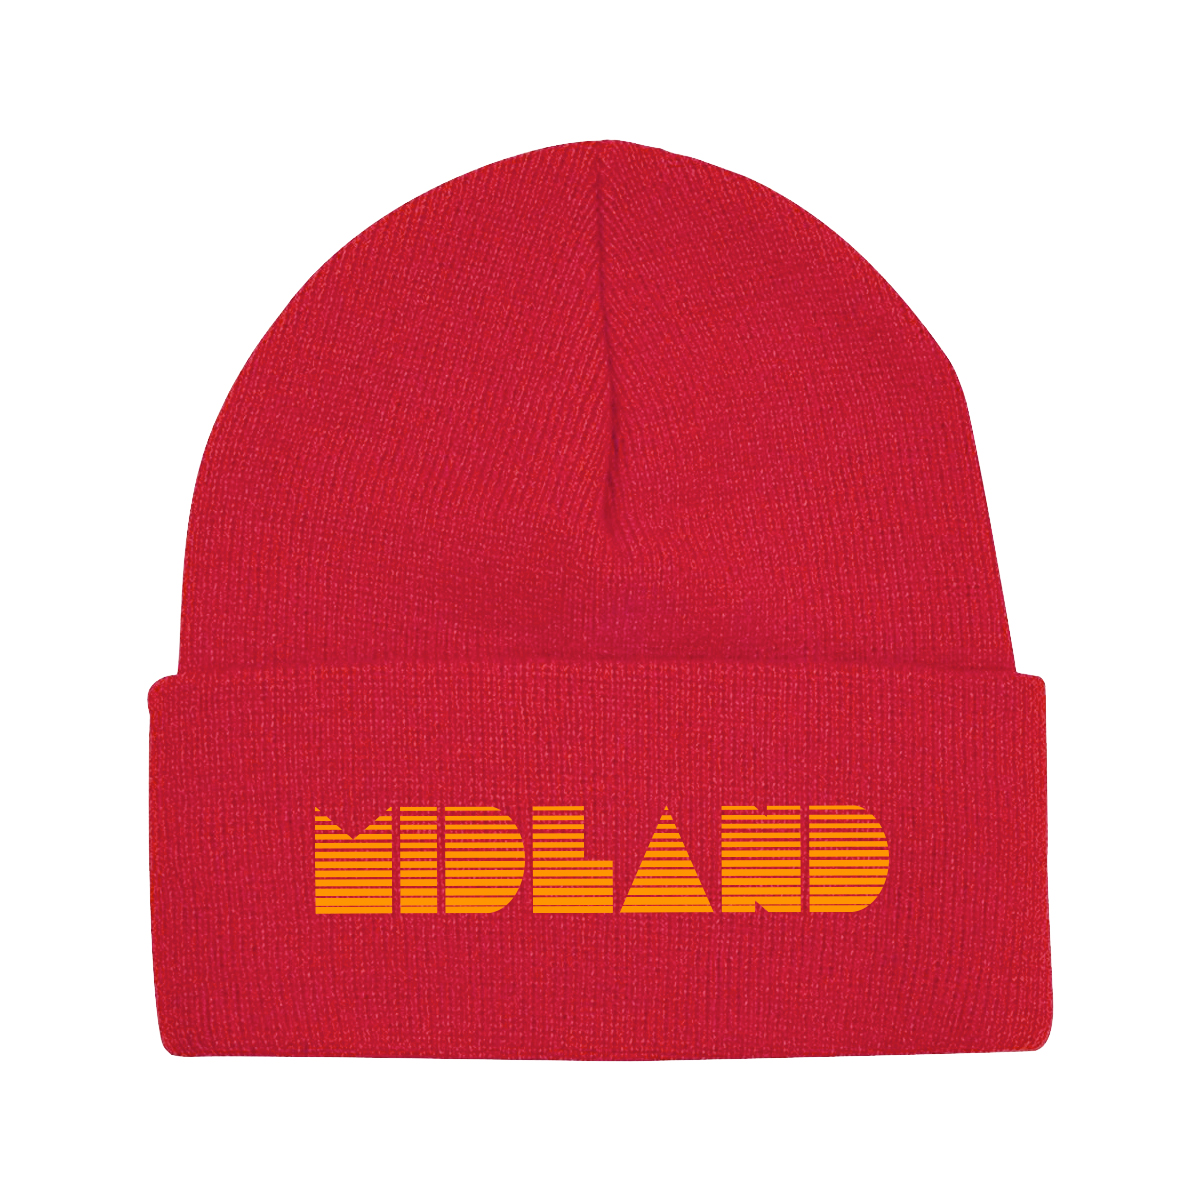 Red Midland Beanie